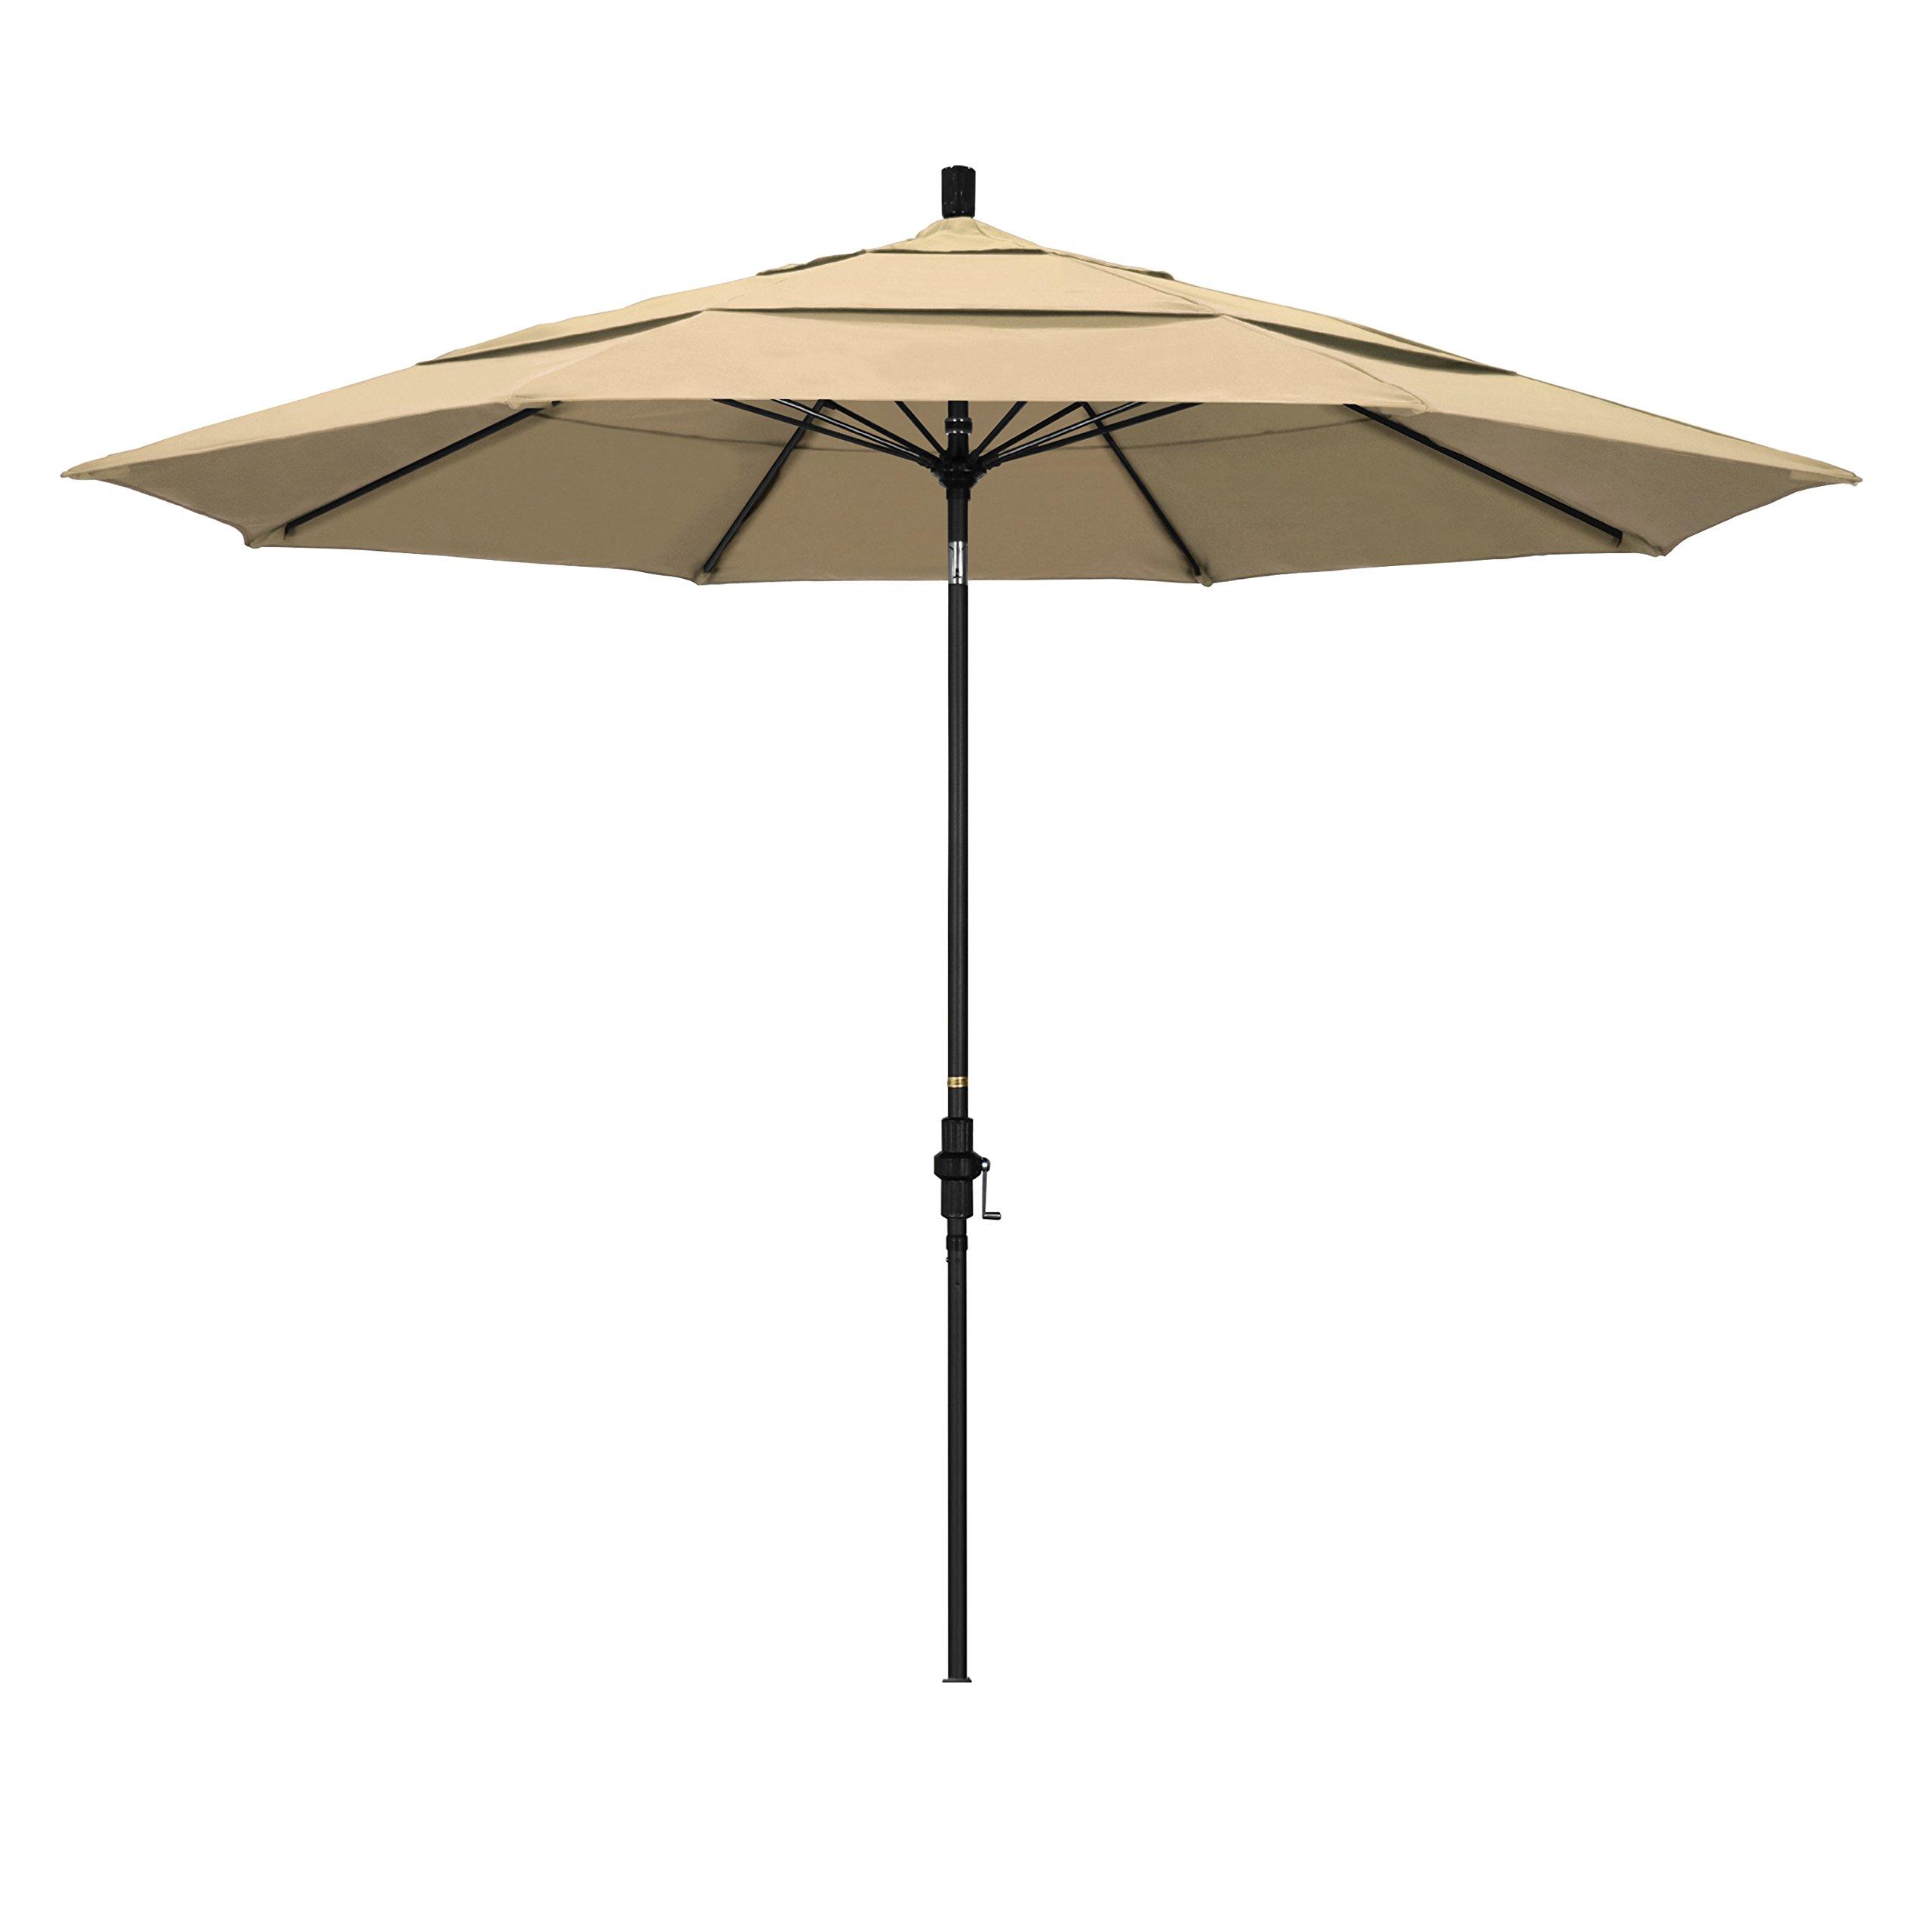 California Umbrella 11' Round Aluminum Pole Fiberglass Rib Market Umbrella, Crank Lift, Collar Tilt, Black Pole, Antique Beige Olefin